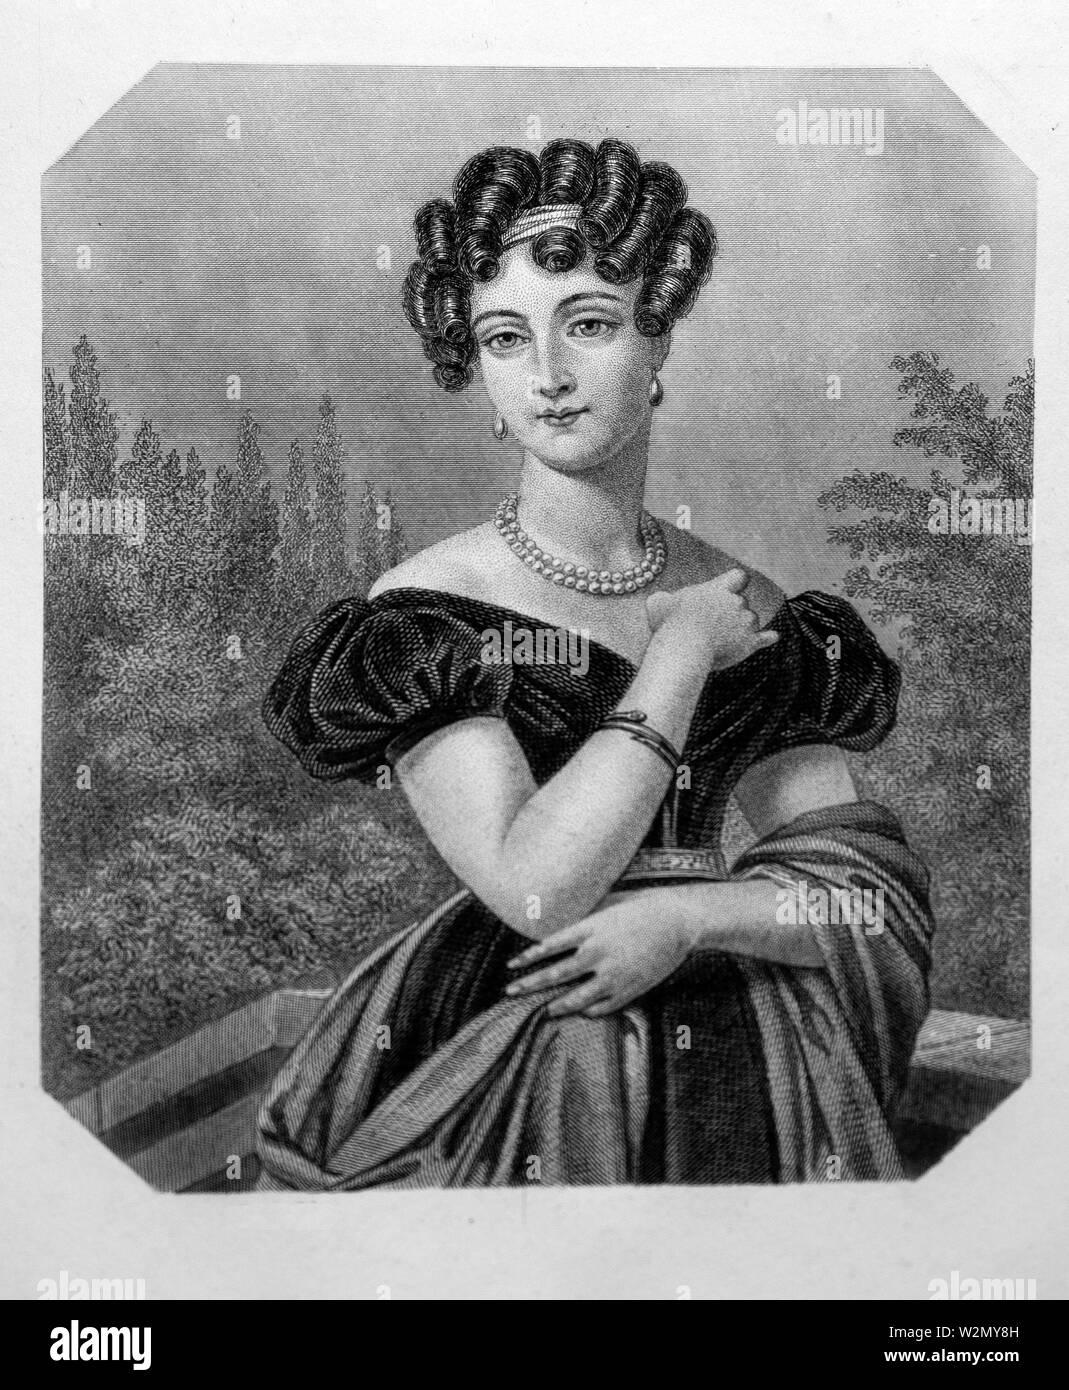 Zoé Talon du Cayla..Zoé Victoire Talon (August 5,1785-March 19, 1852), styled comtesse du Cayla, was an intimate friend and confidante of Louis XVIII - Stock Image